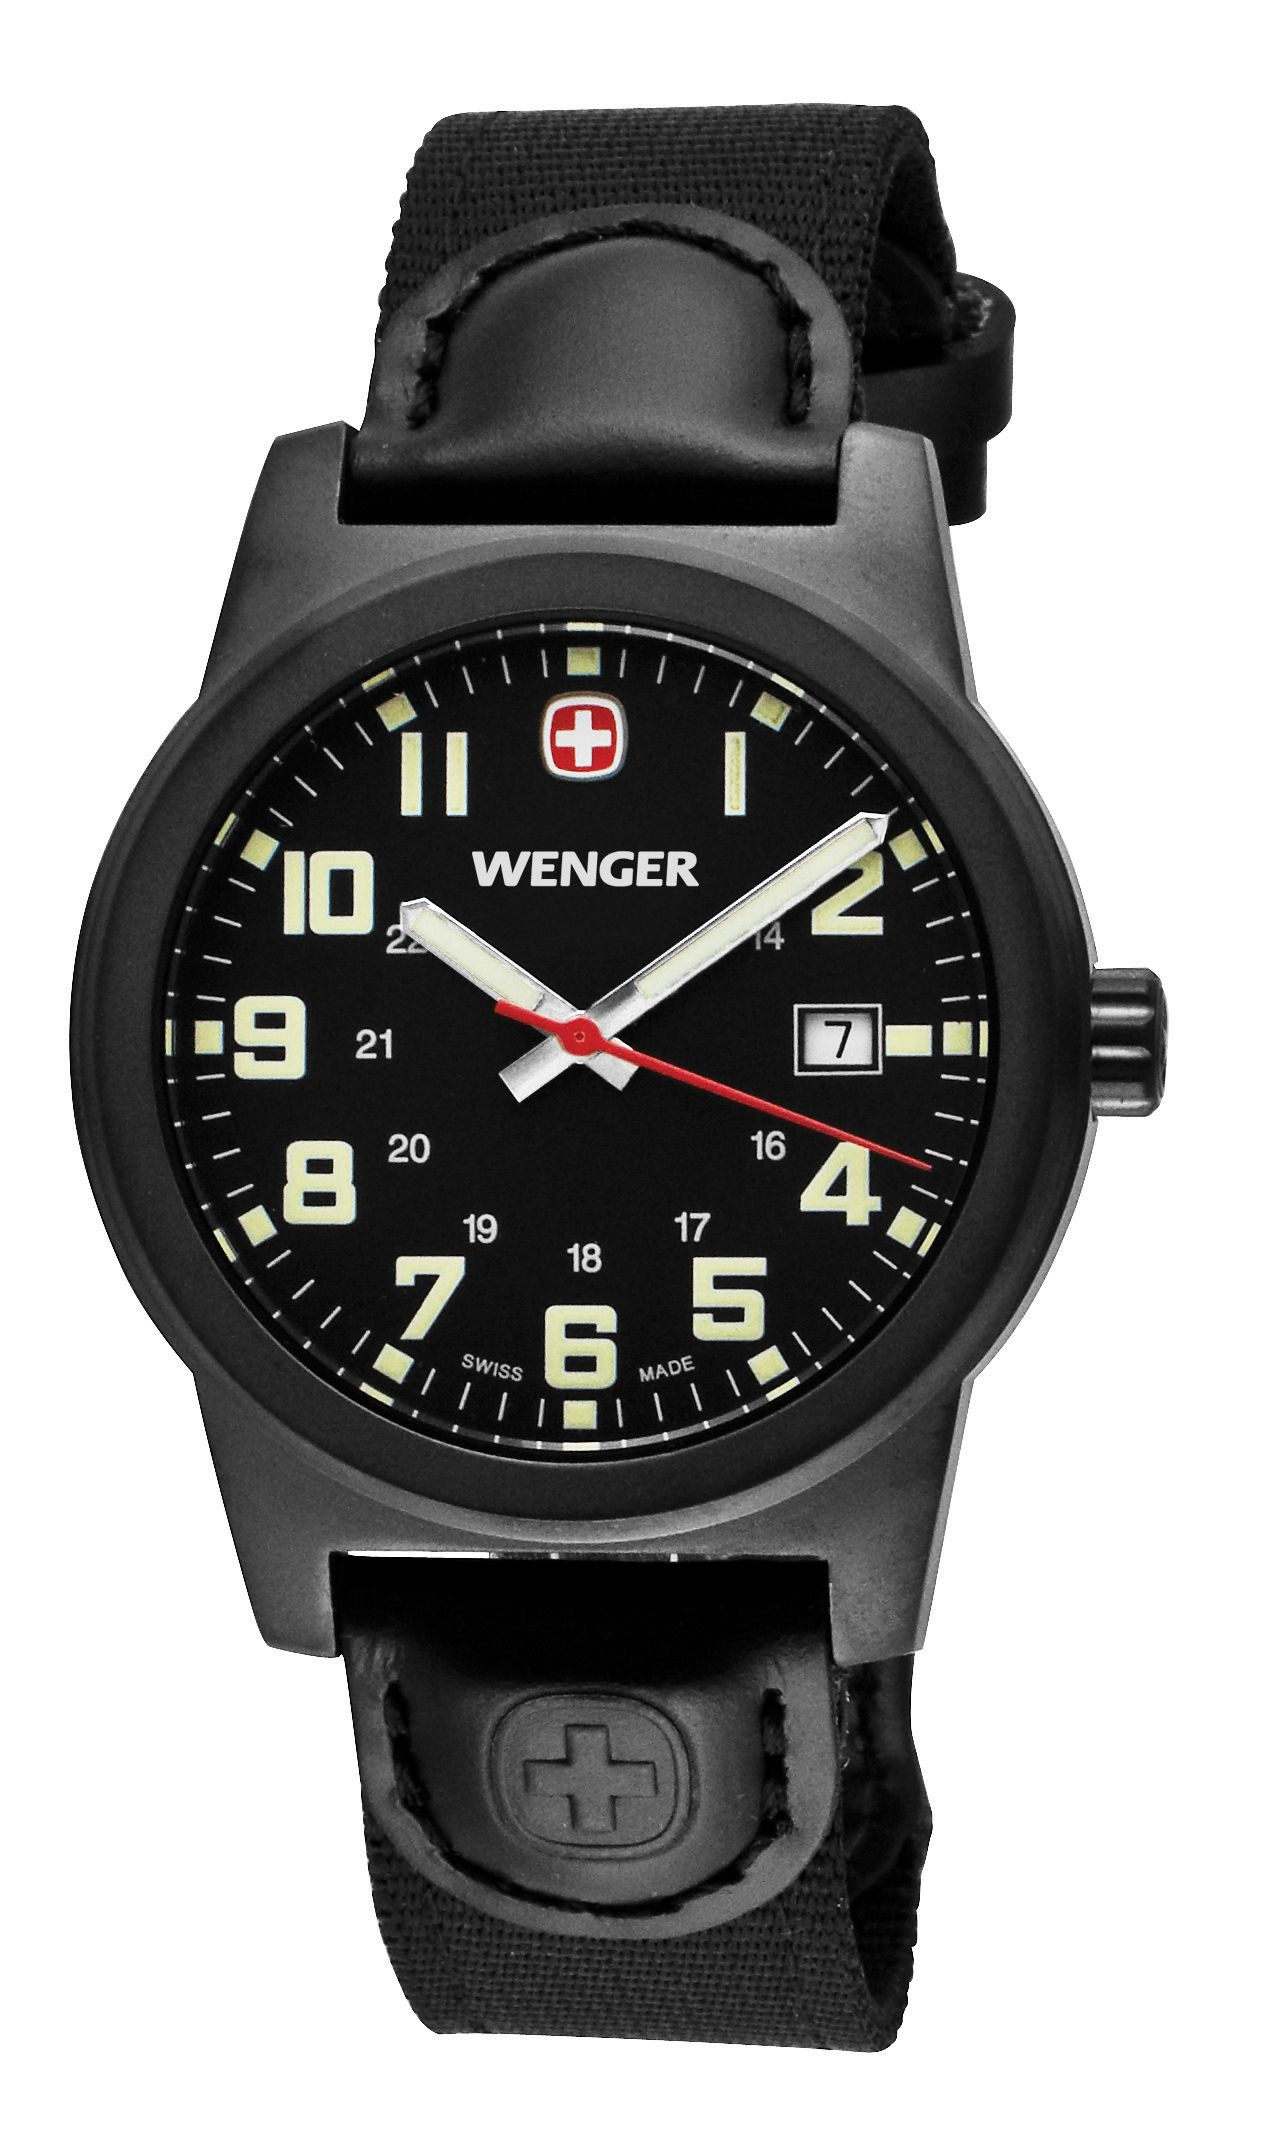 48ccbb959fd Wenger Field Classic - Black Dial and Black Nylon Band Wrist Watch - Men s  - Victorinox - Swiss Army